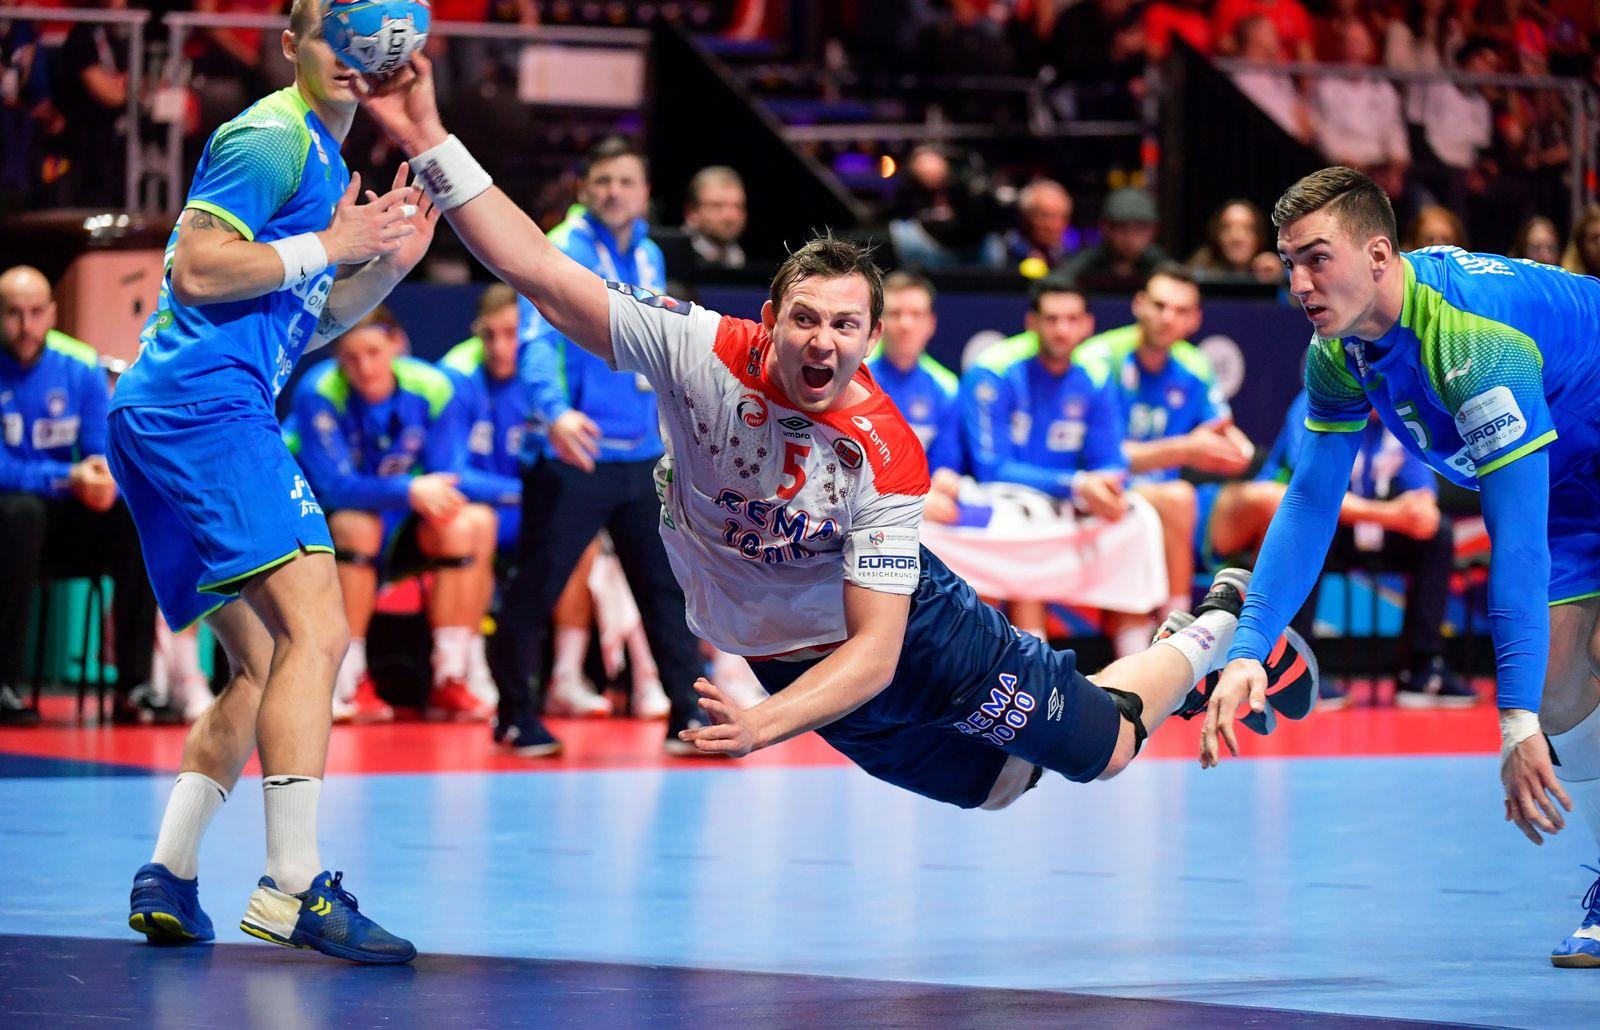 EHF Handball Men European Championship, Stockholm, Sweden - 25 Jan 2020